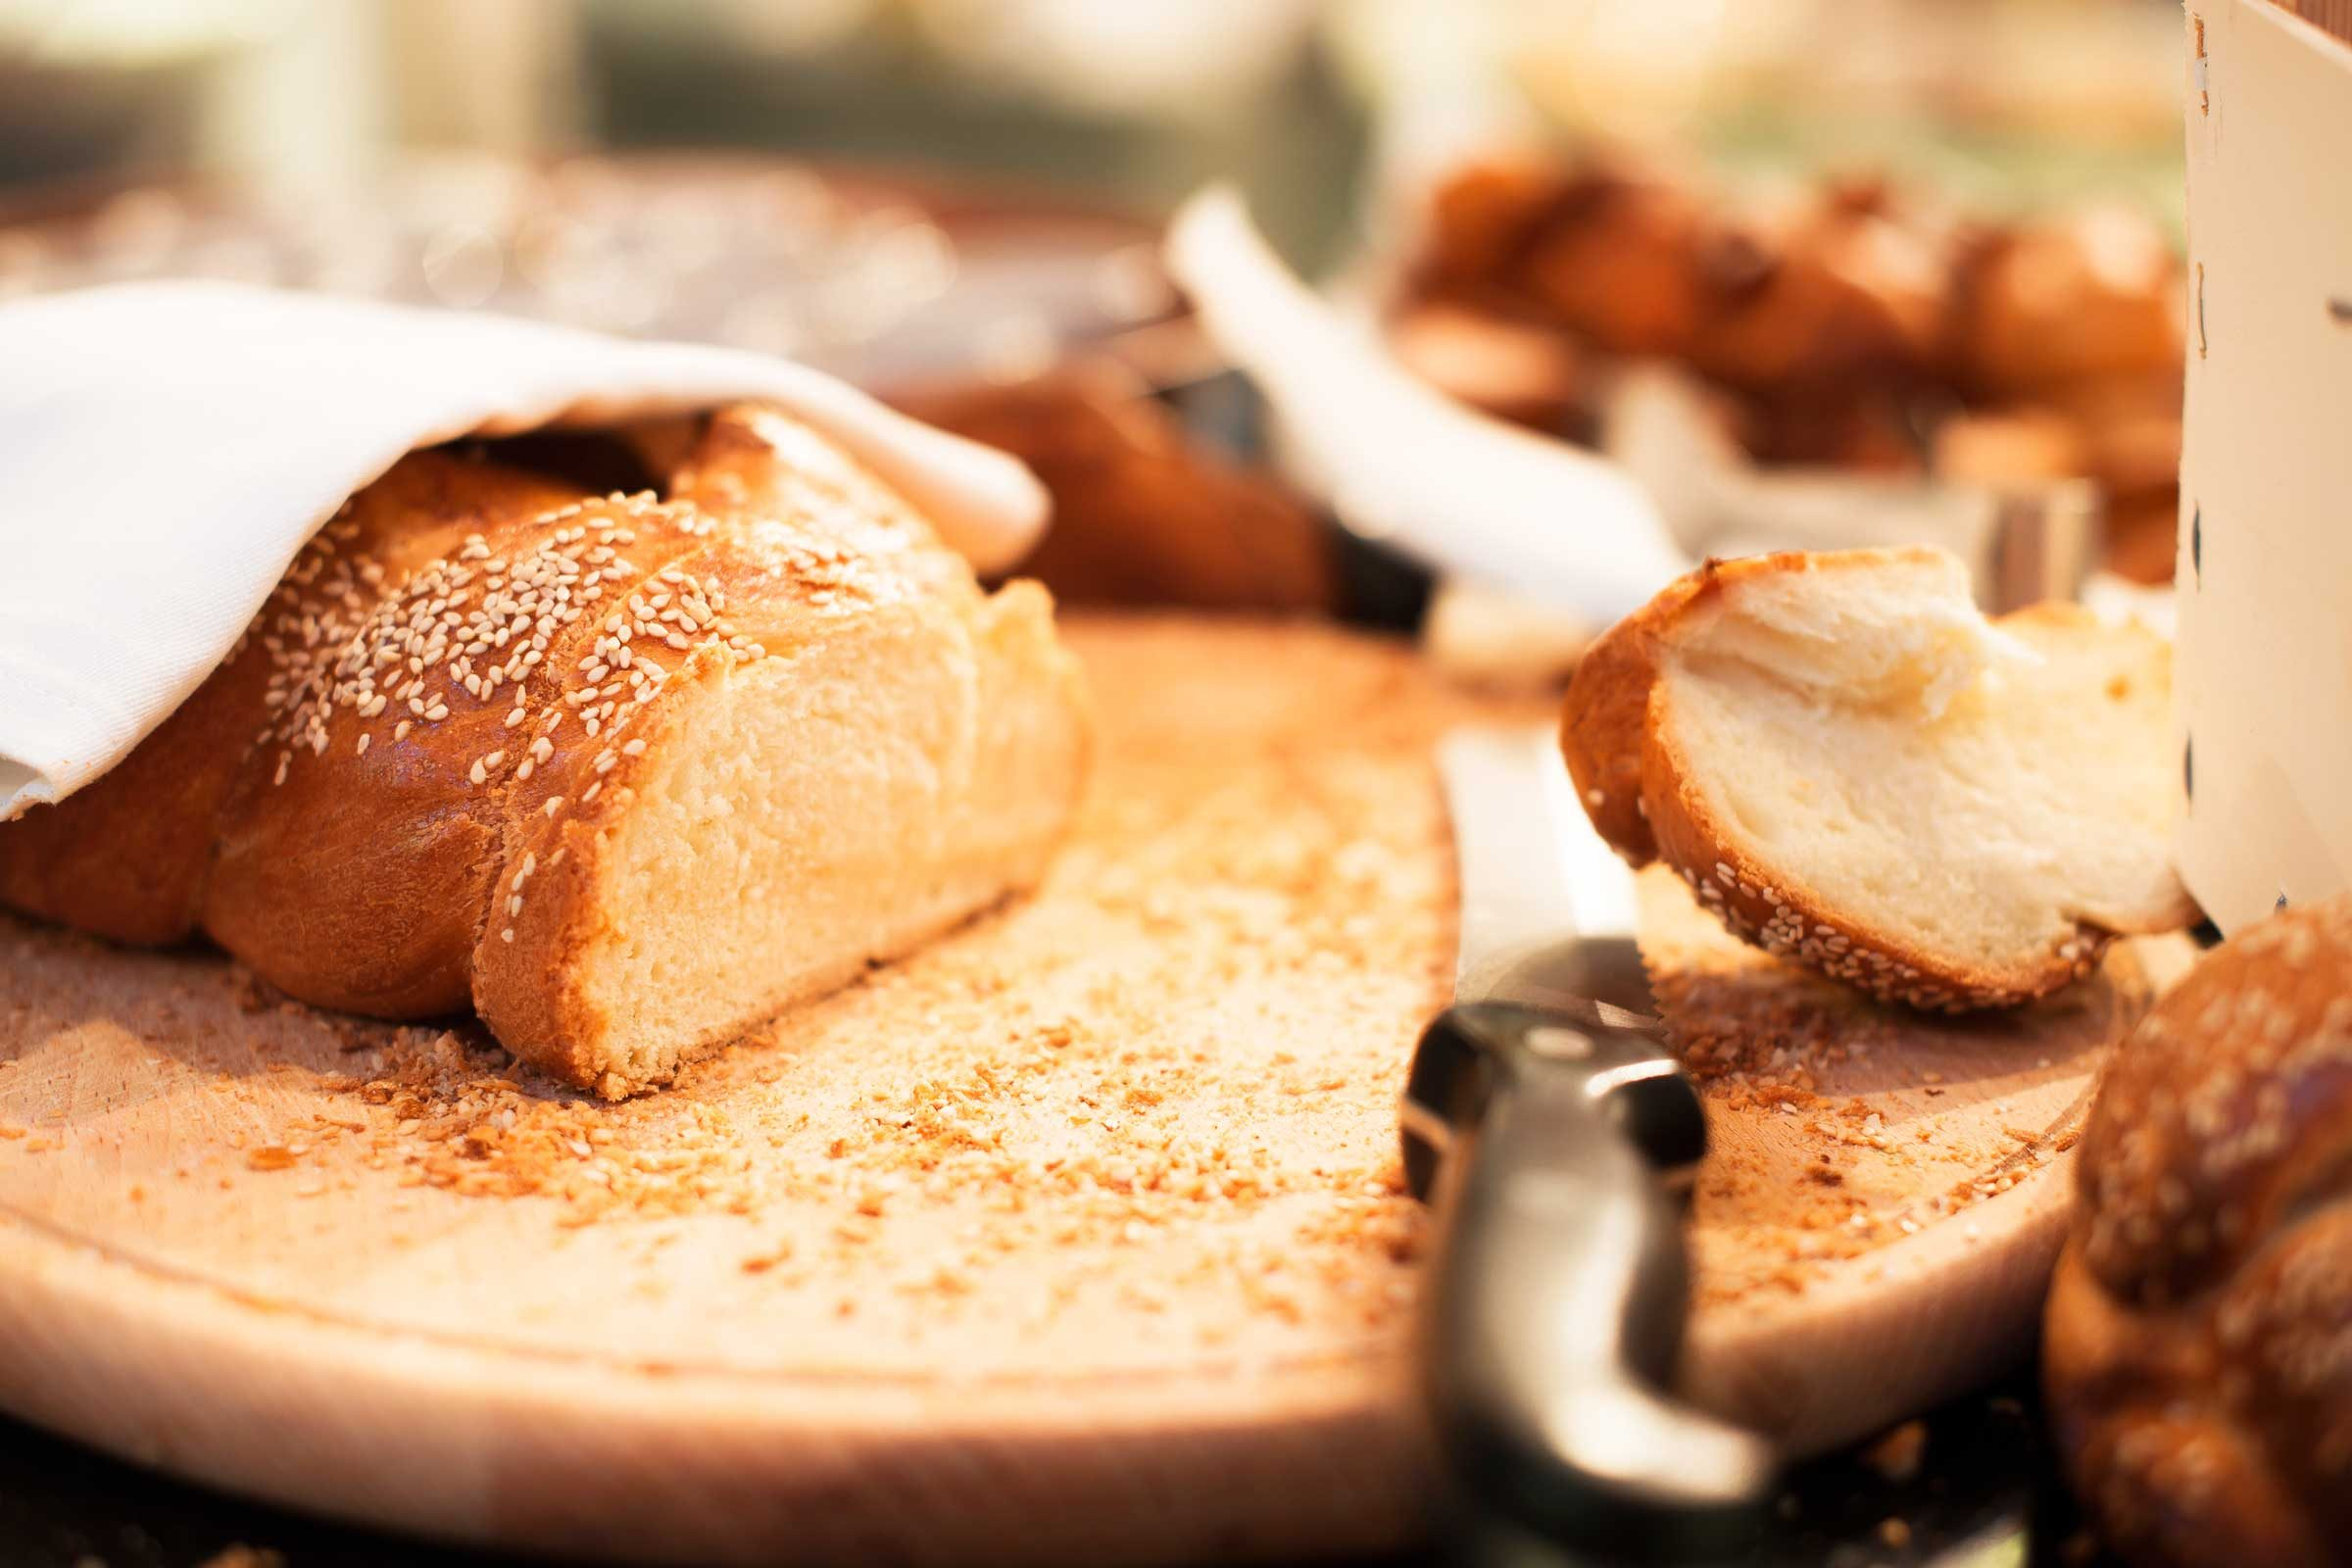 foods_Will_make_arthritis_worse_flour-based